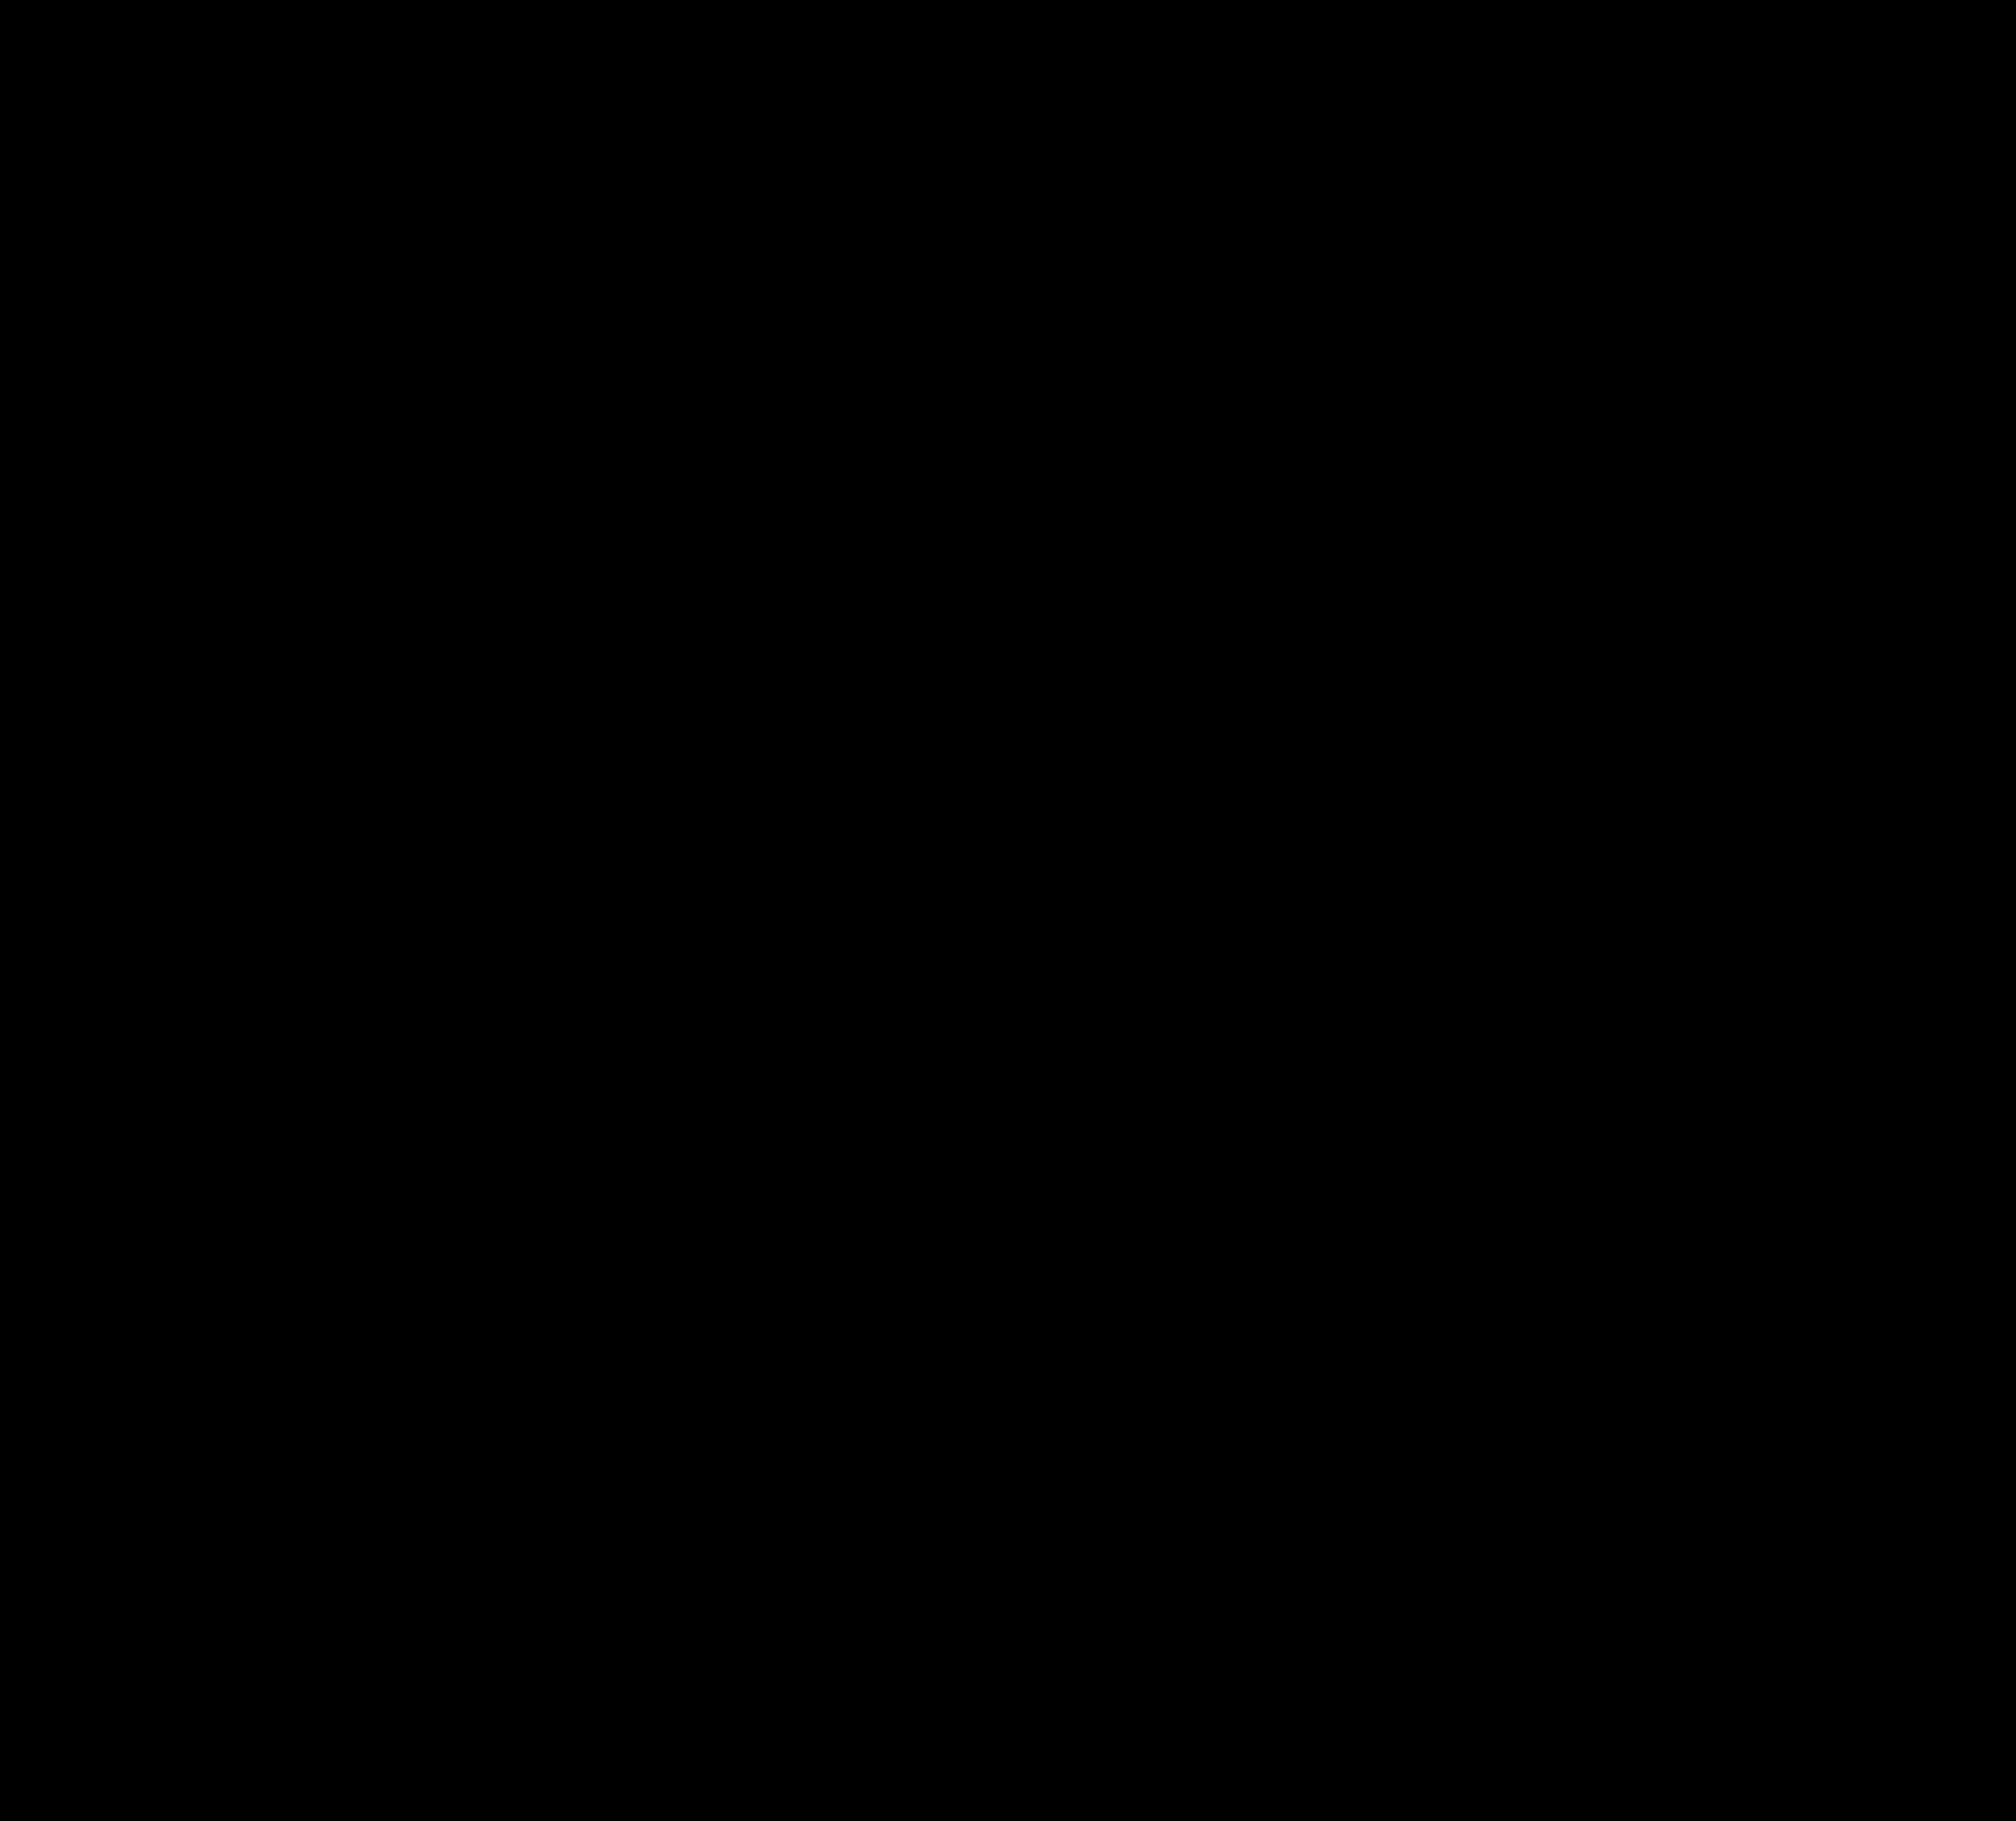 Symbols for mining biocorpaavc